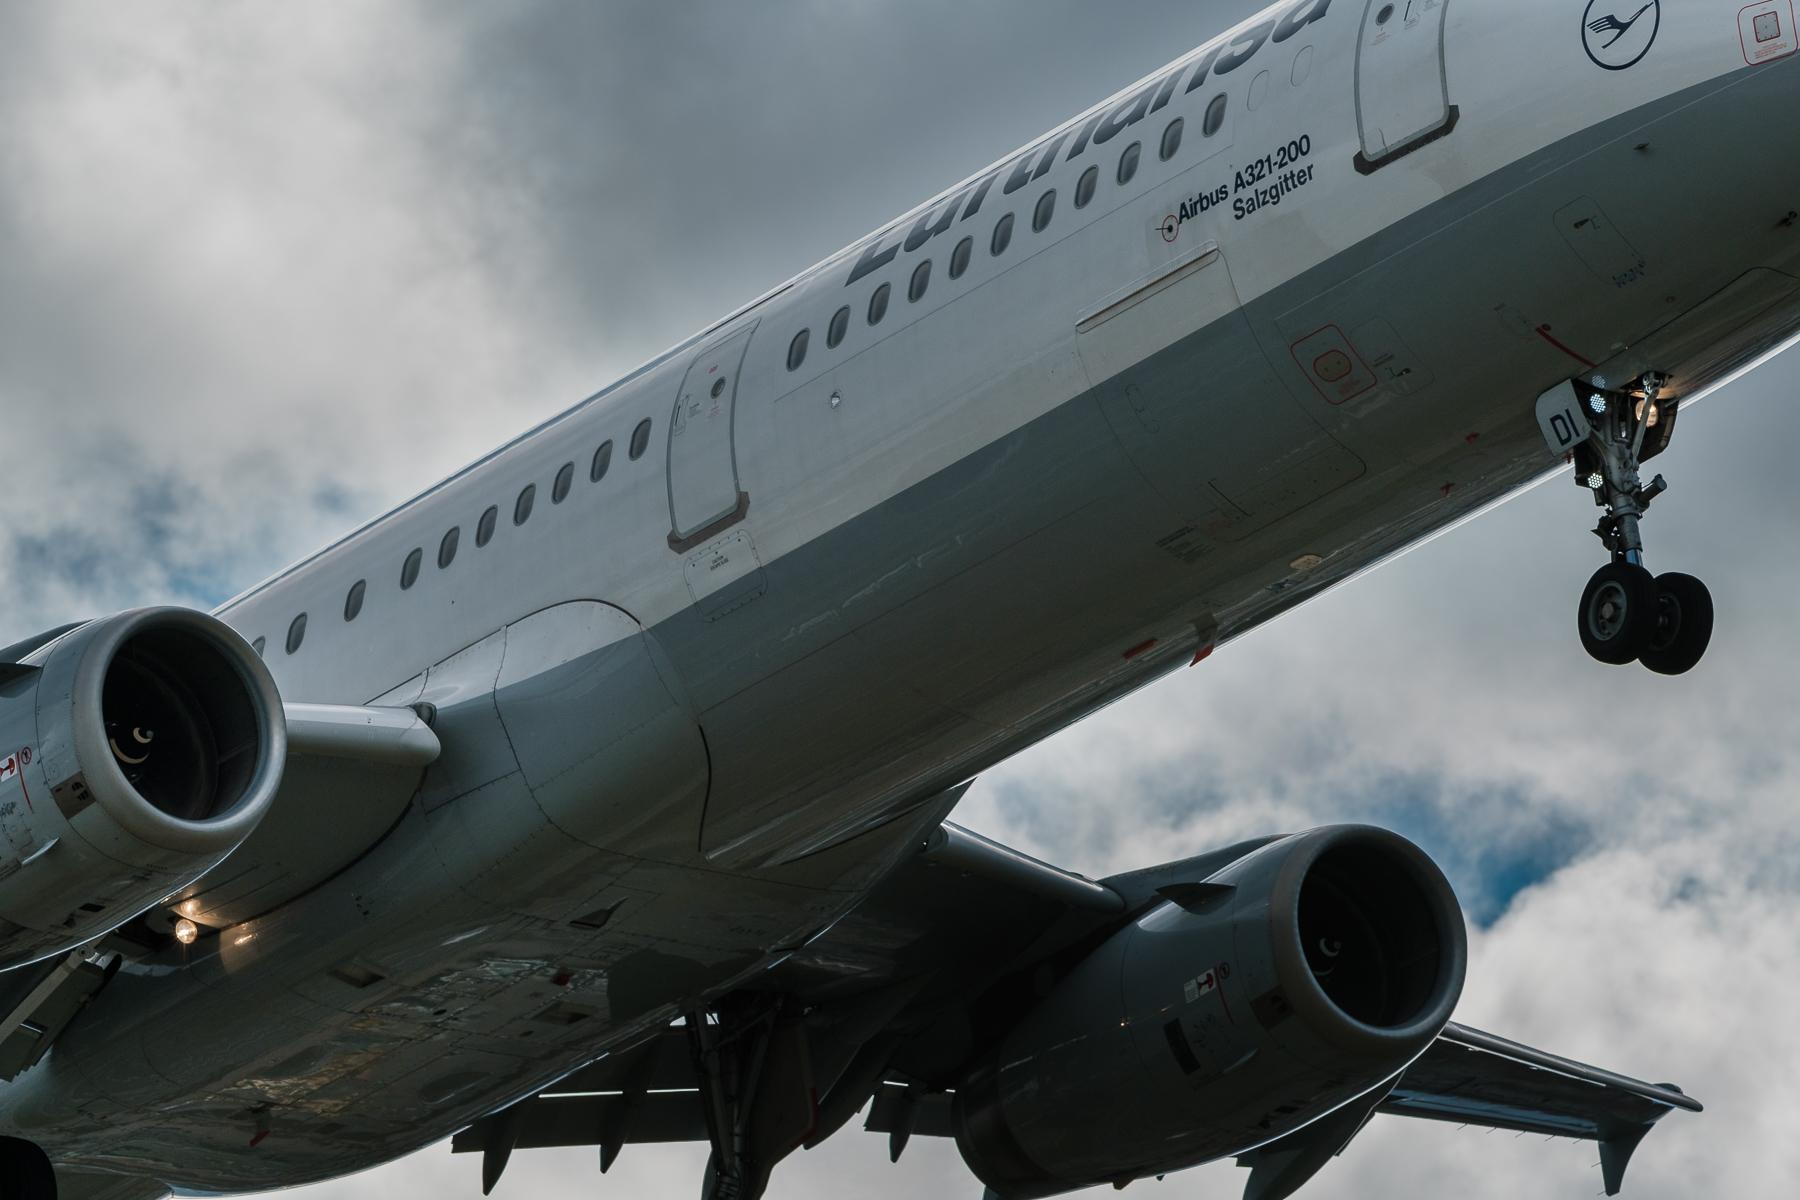 Flughafen Zürich-Kloten Landungen Runway 28